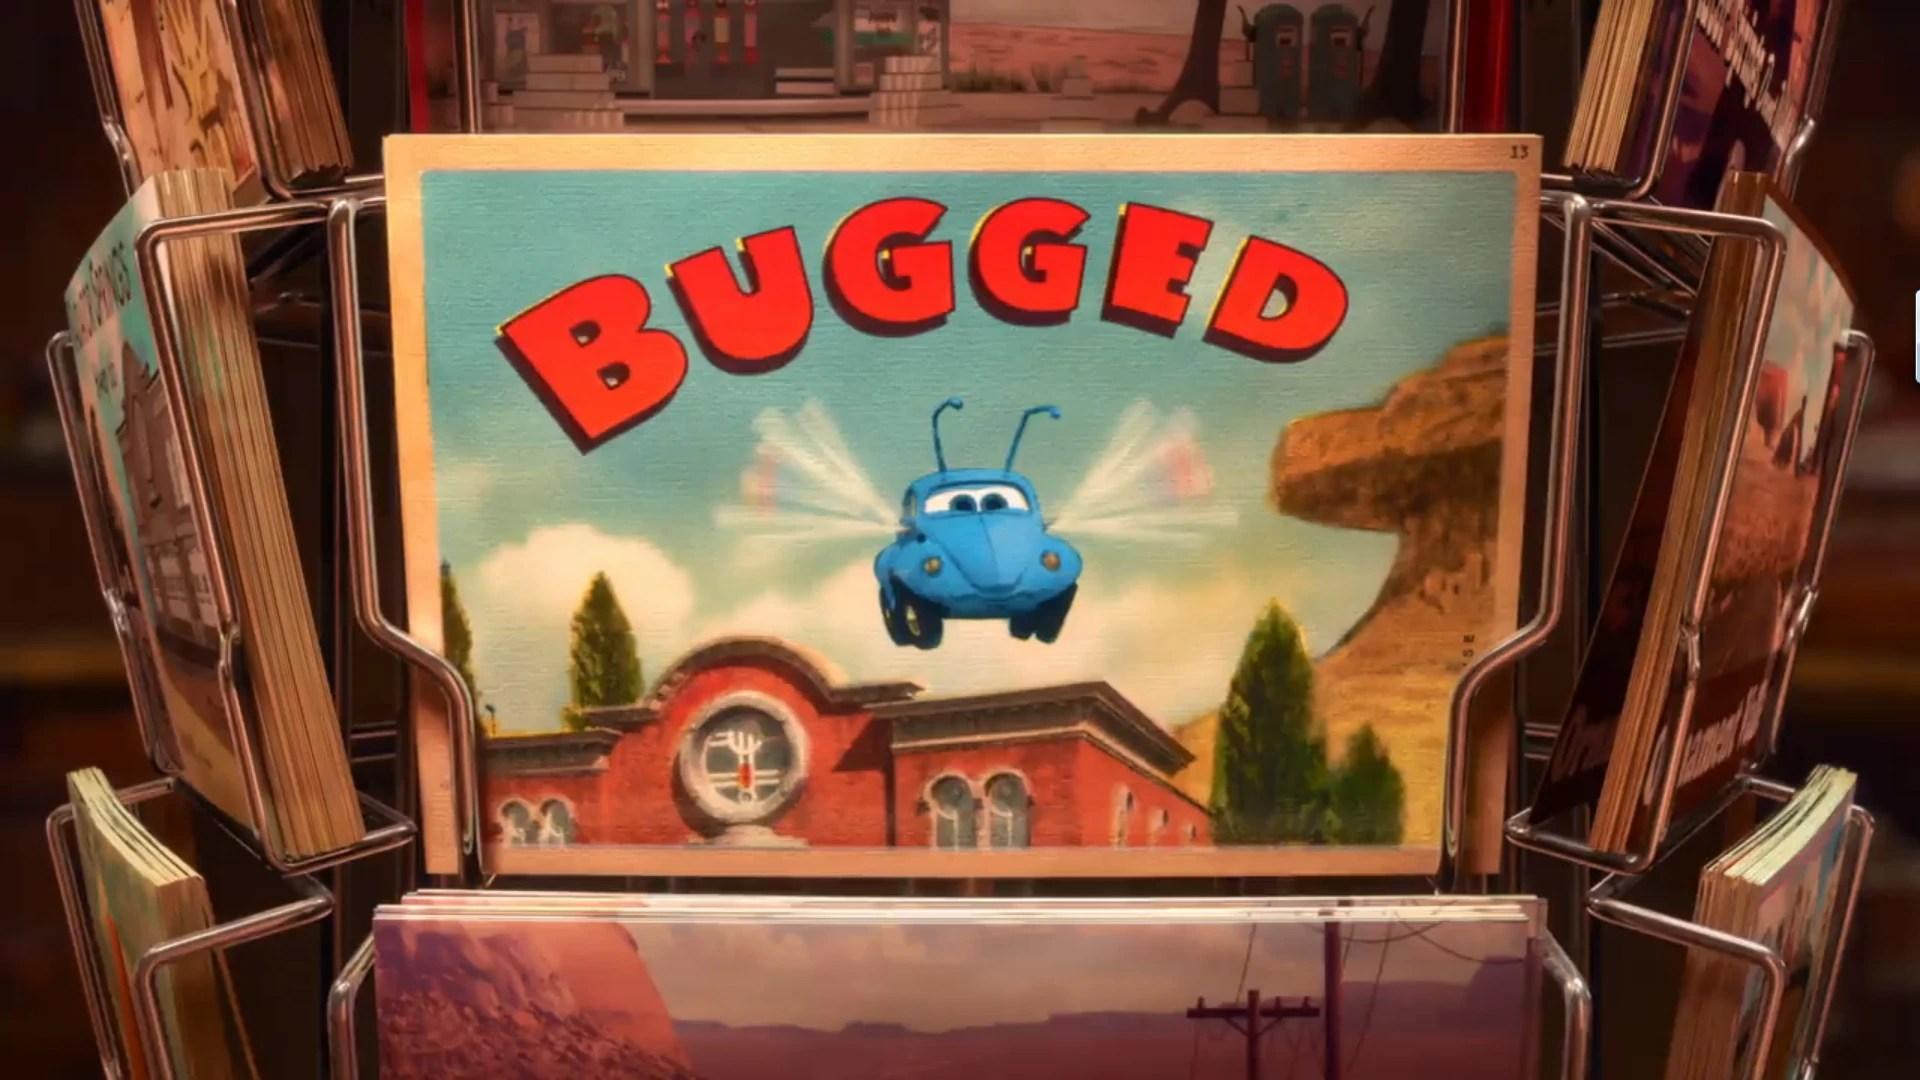 Pixar Cars Wallpaper Bugged Pixar Wiki Fandom Powered By Wikia